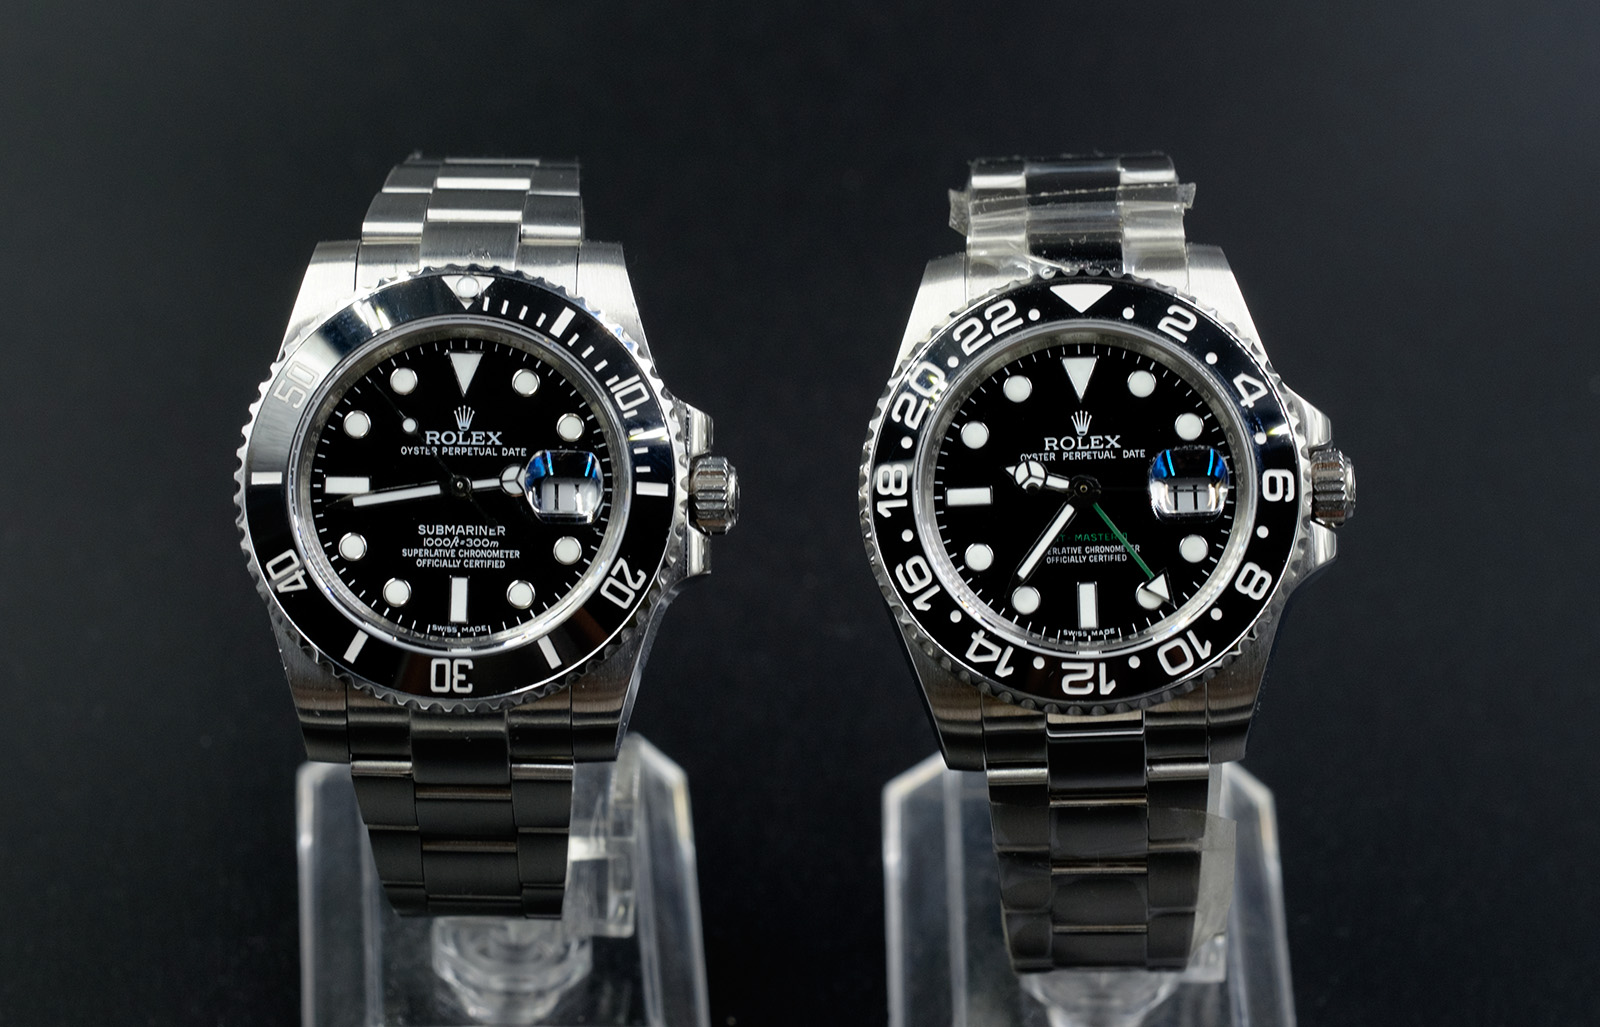 Submariner and GMT Master II